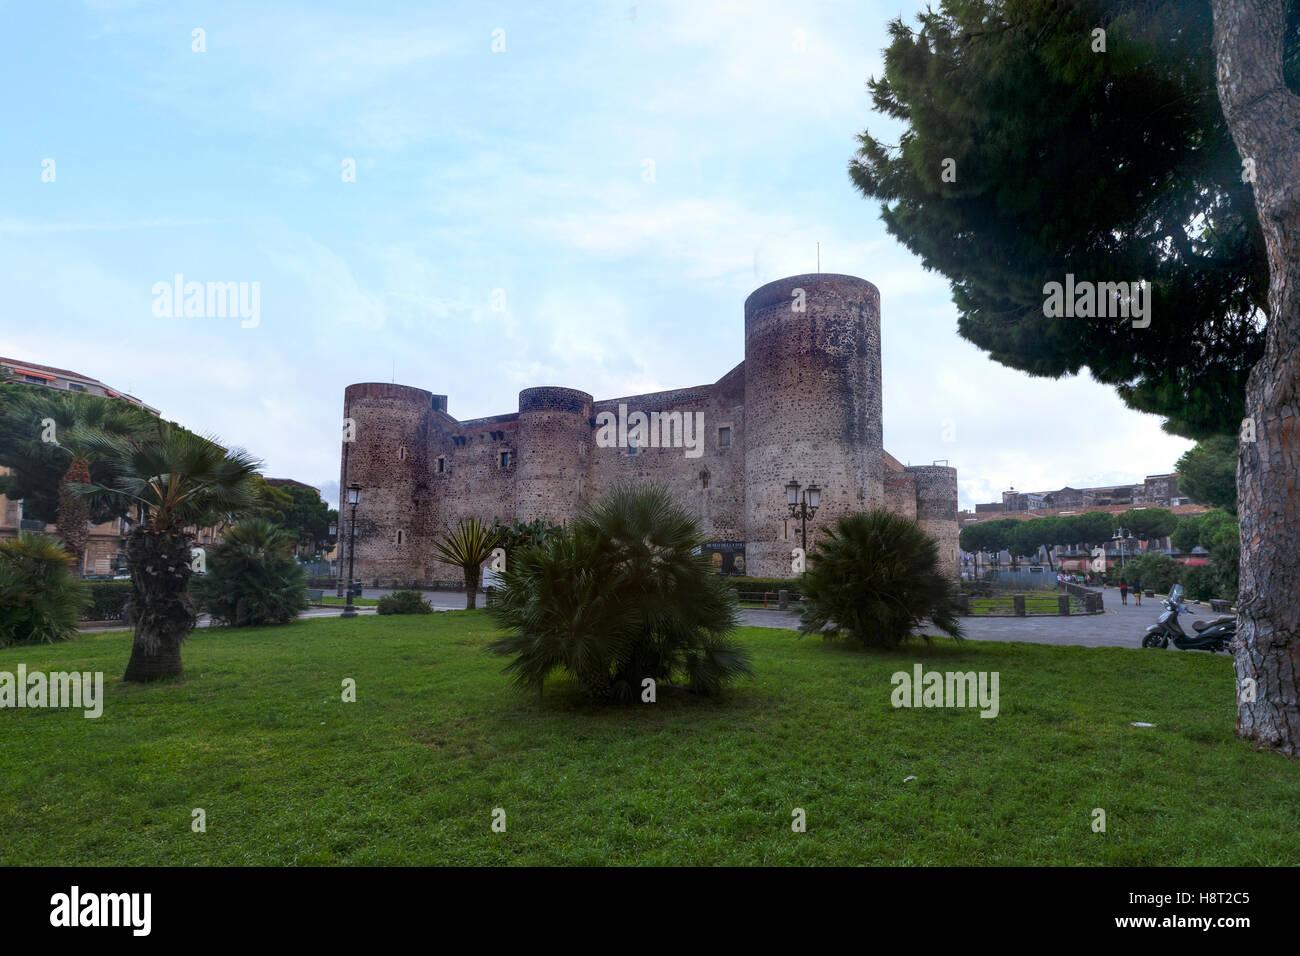 Castello Ursino, Catania, Sizilien, Italien Stockbild